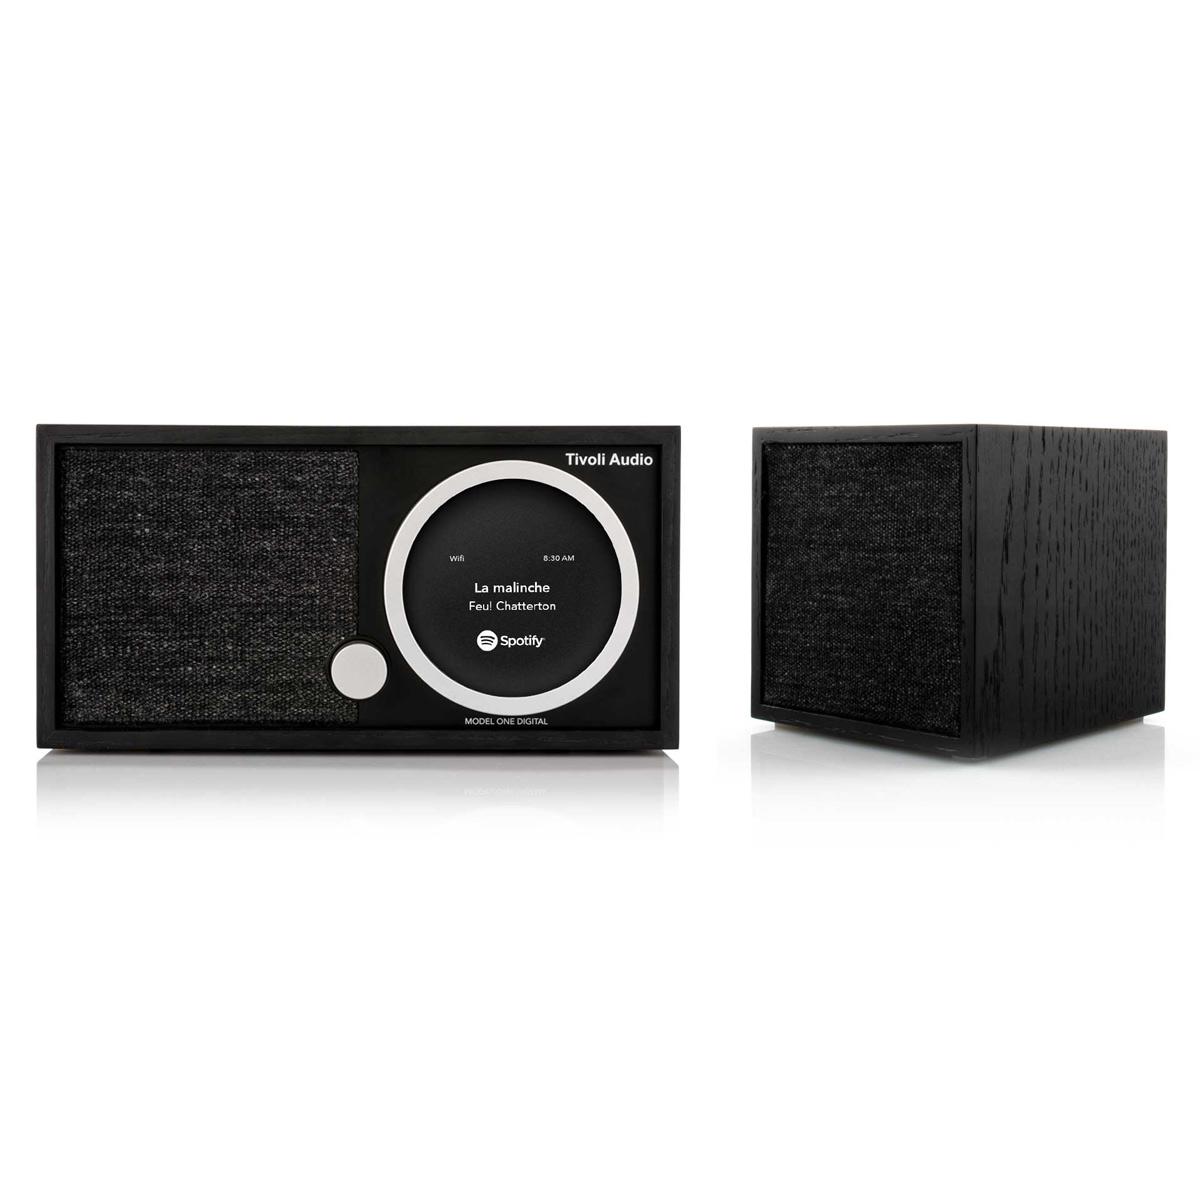 Tivoli Audio Model One Digital FM Wi-Fi Bluetooth Radio Wireless Stereo Music System with CUBE Speaker by Tivoli Audio